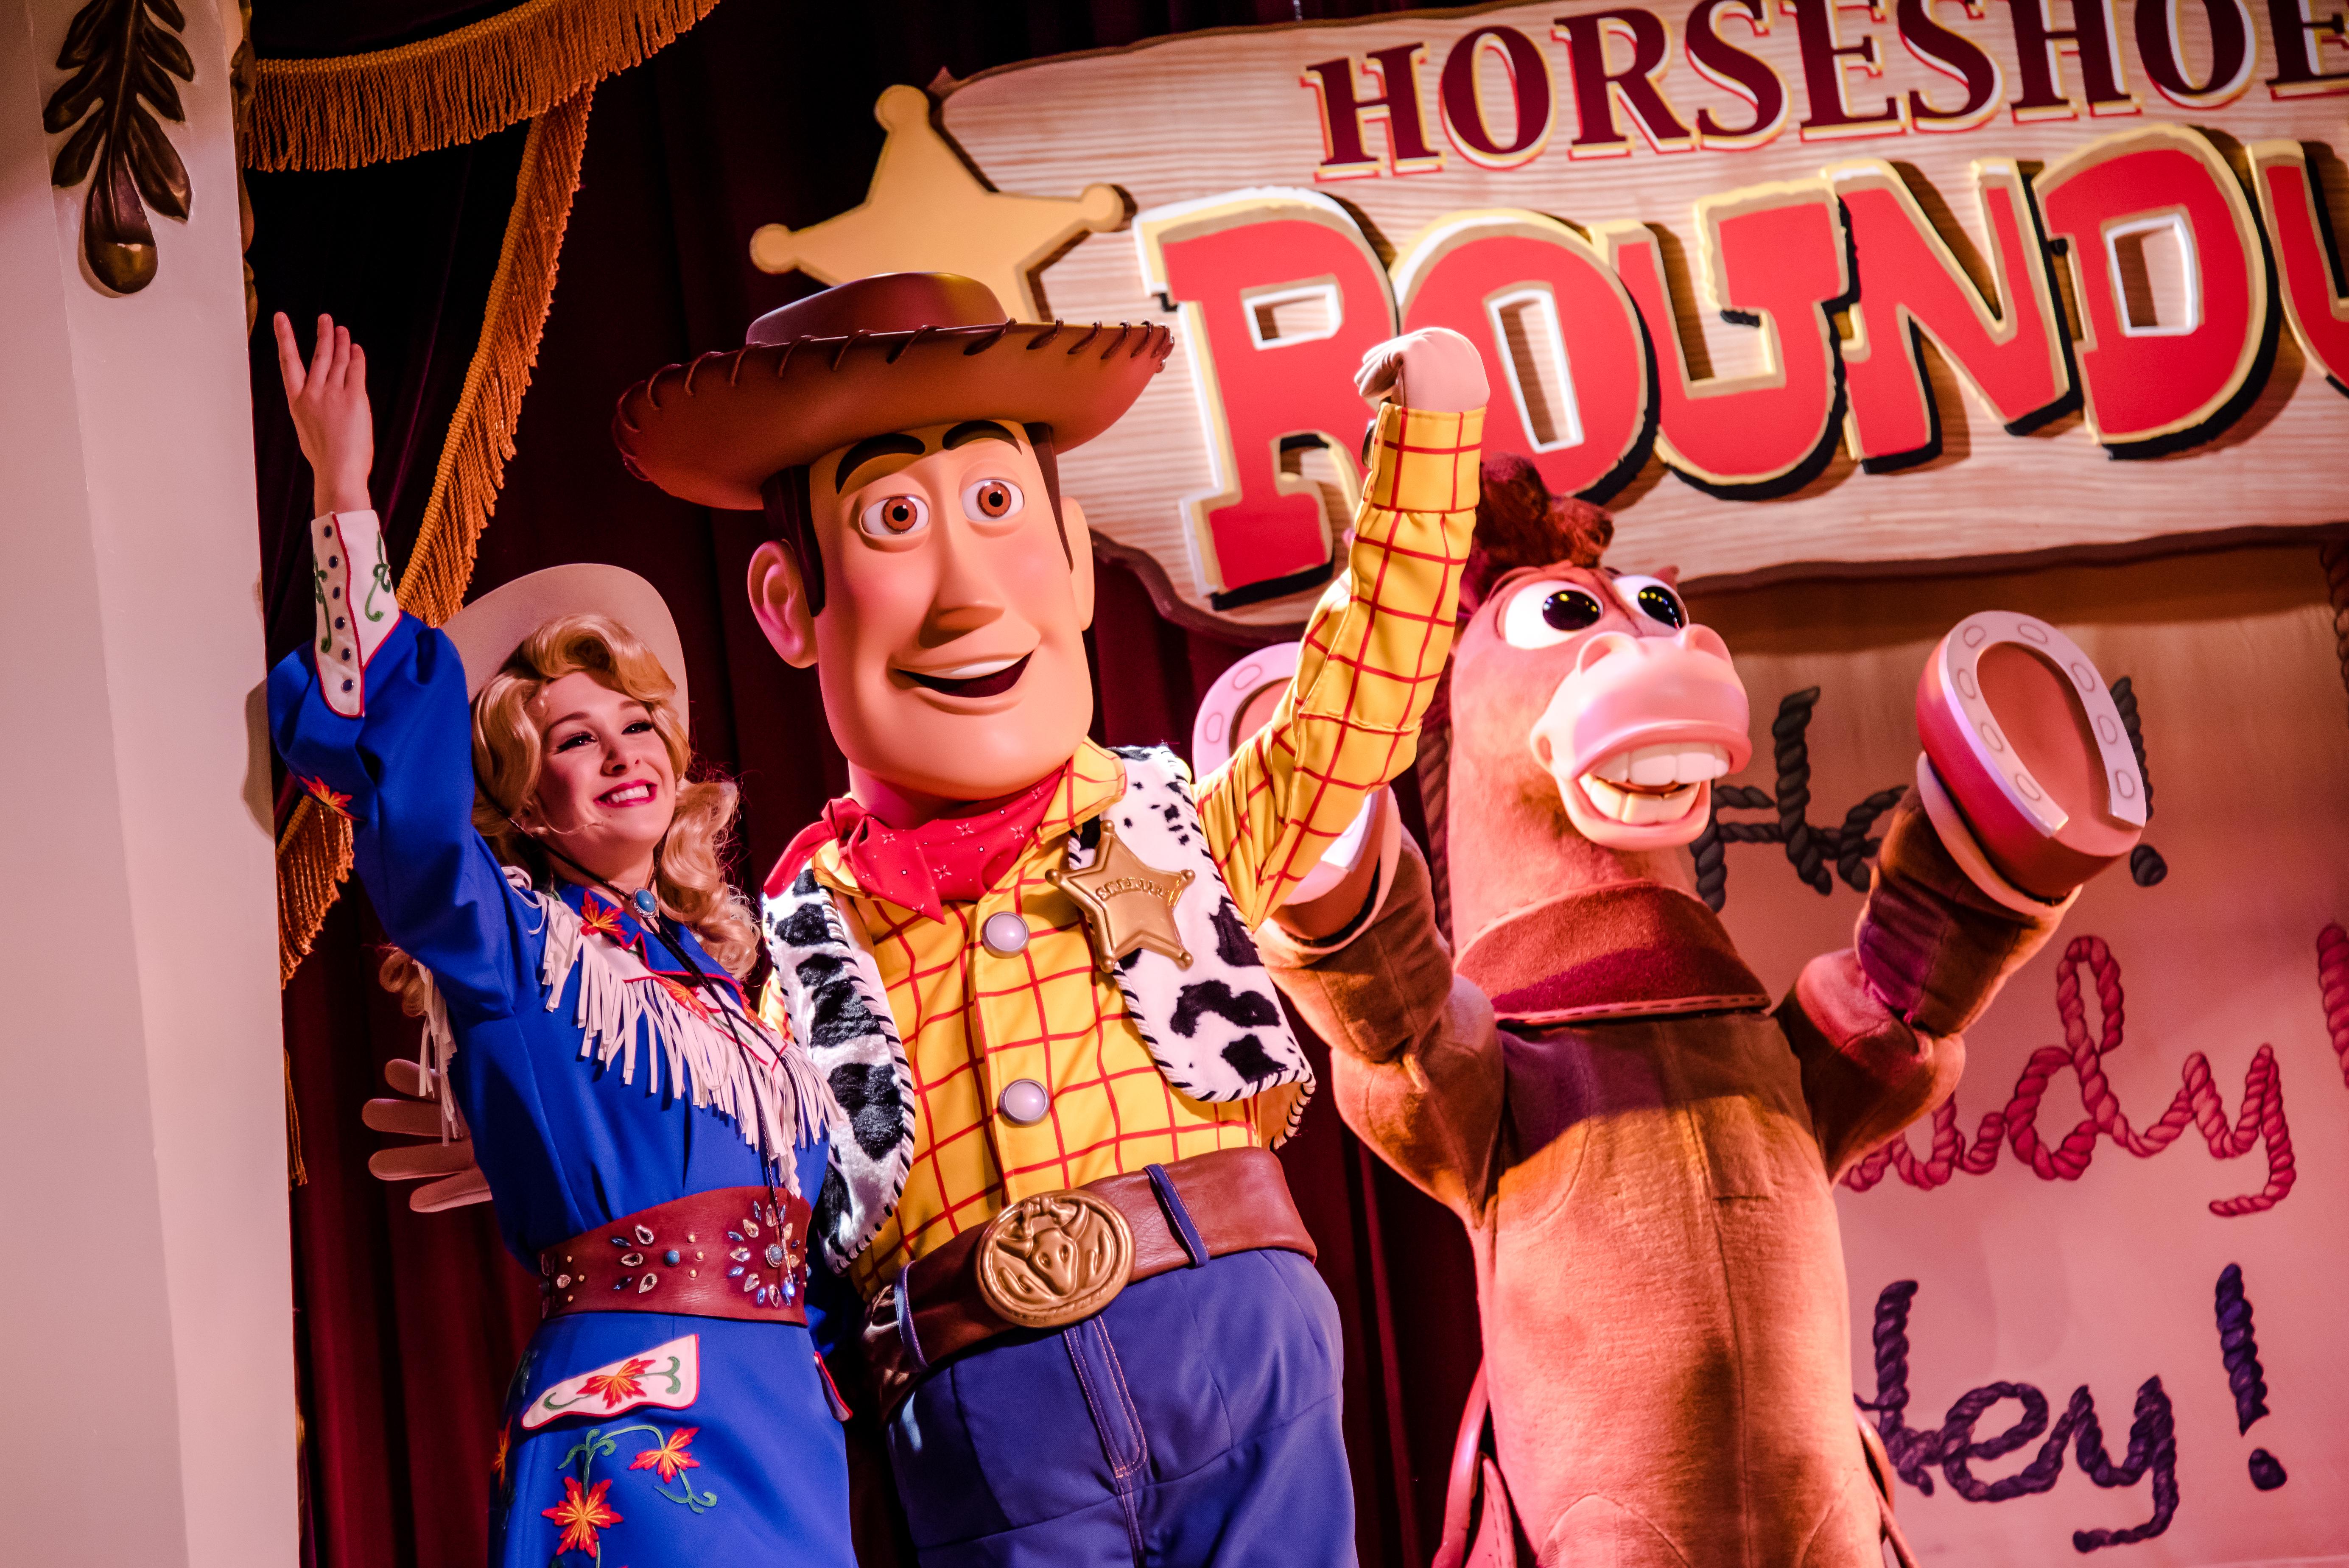 Horseshoe Round Up at Tokyo Disney Resort